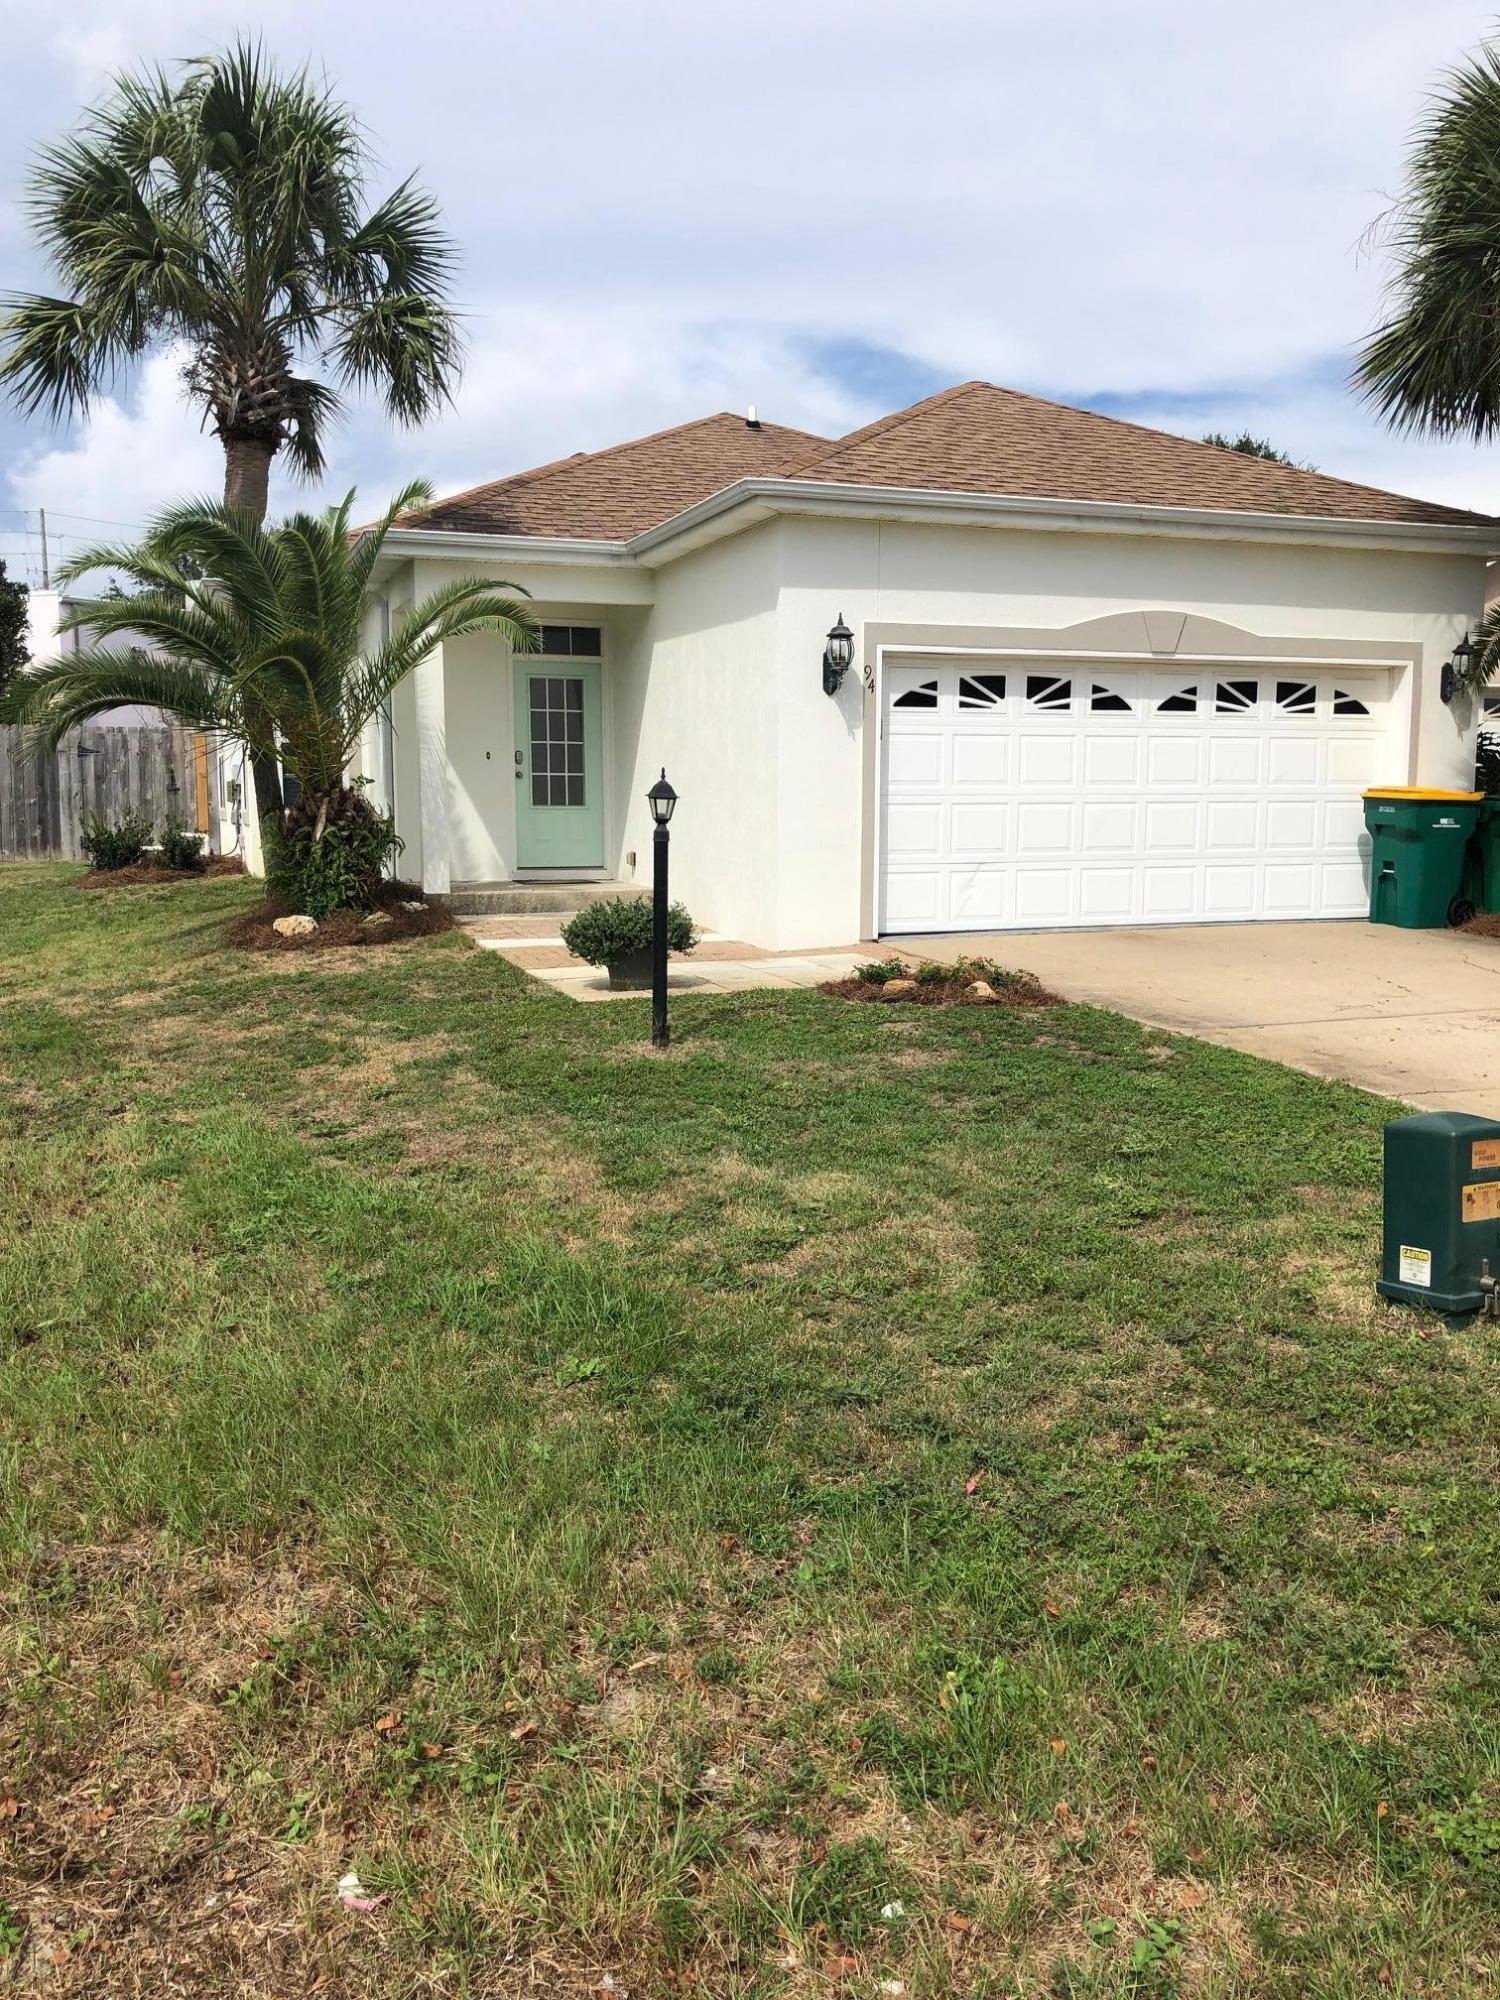 Photo of home for sale at 94 Trista Terrace, Destin FL